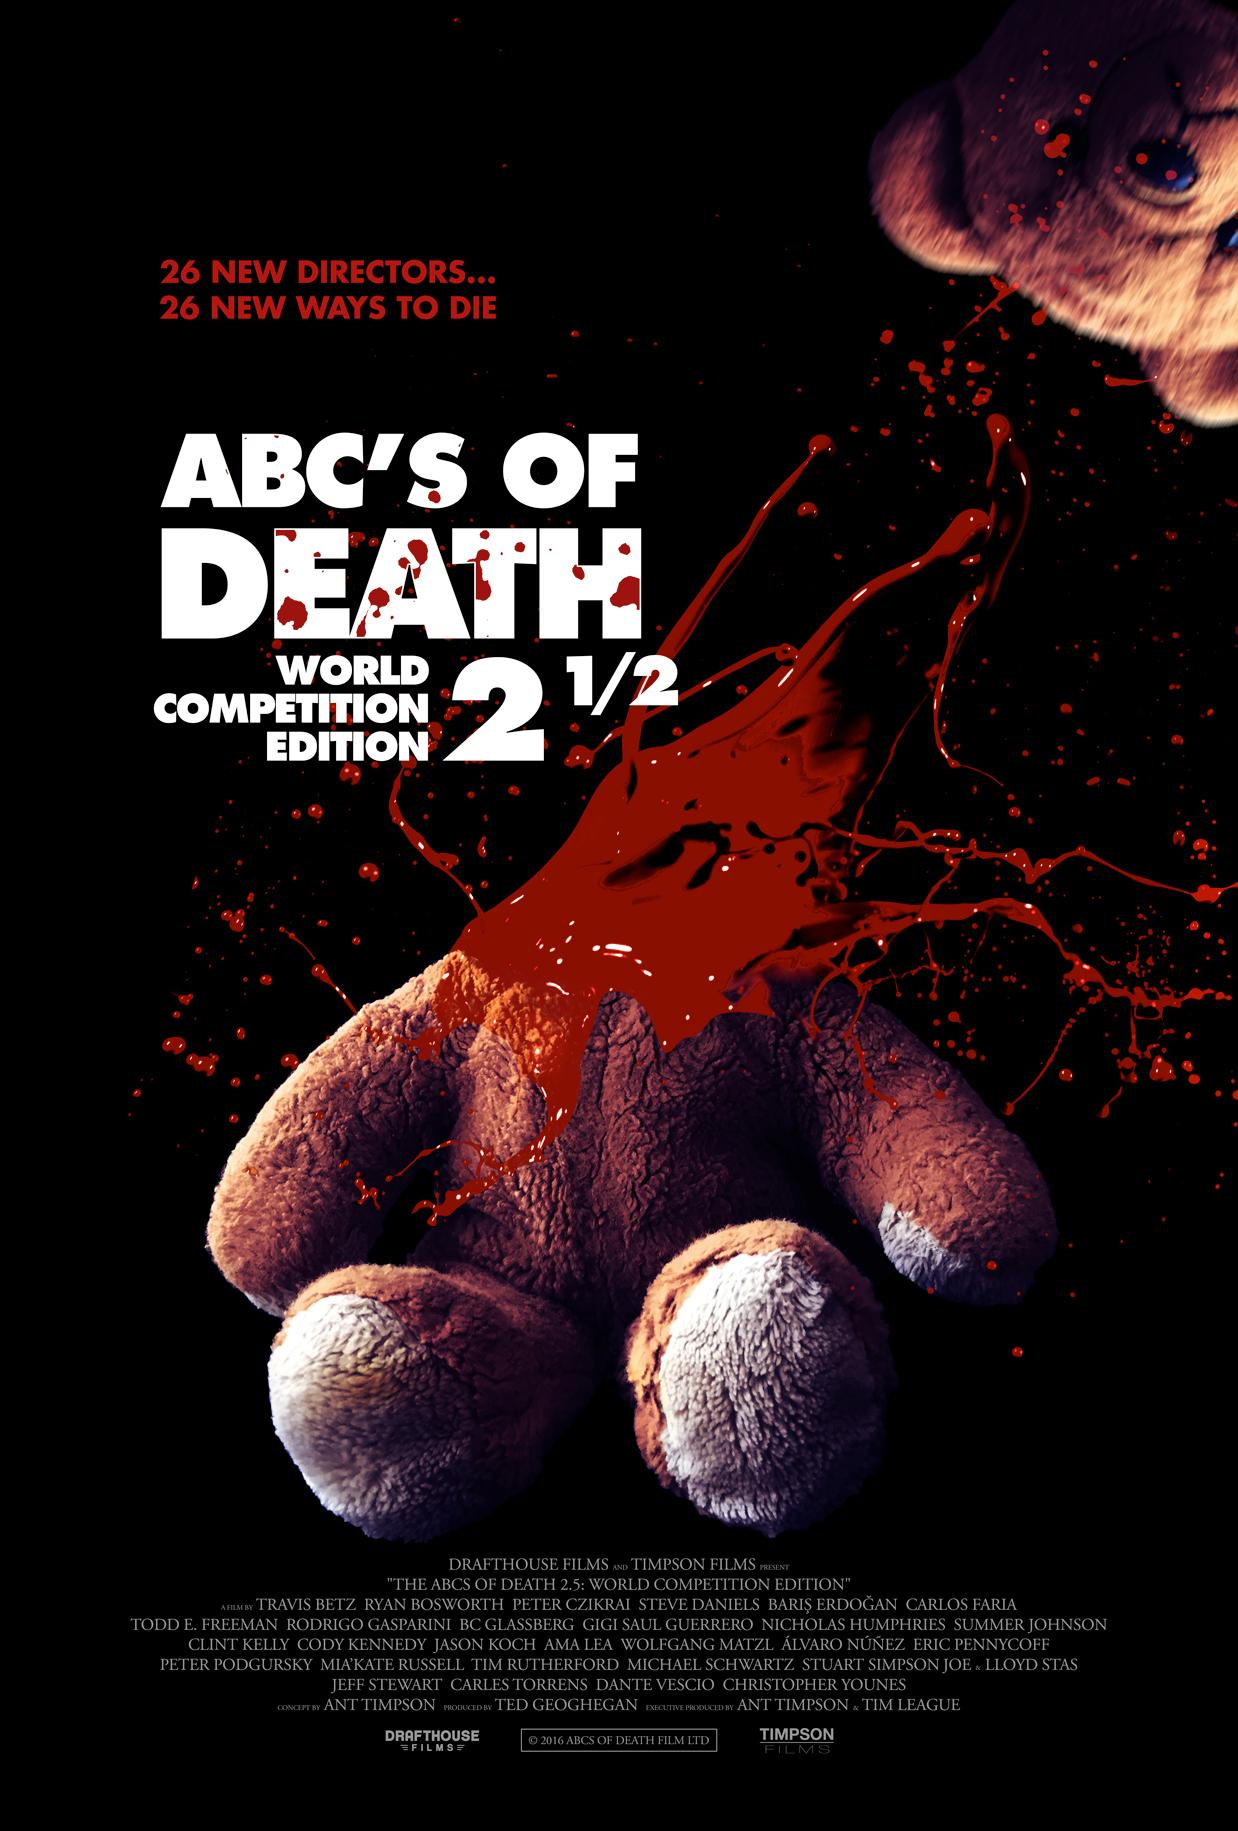 ABCs of Death 2.5 kapak